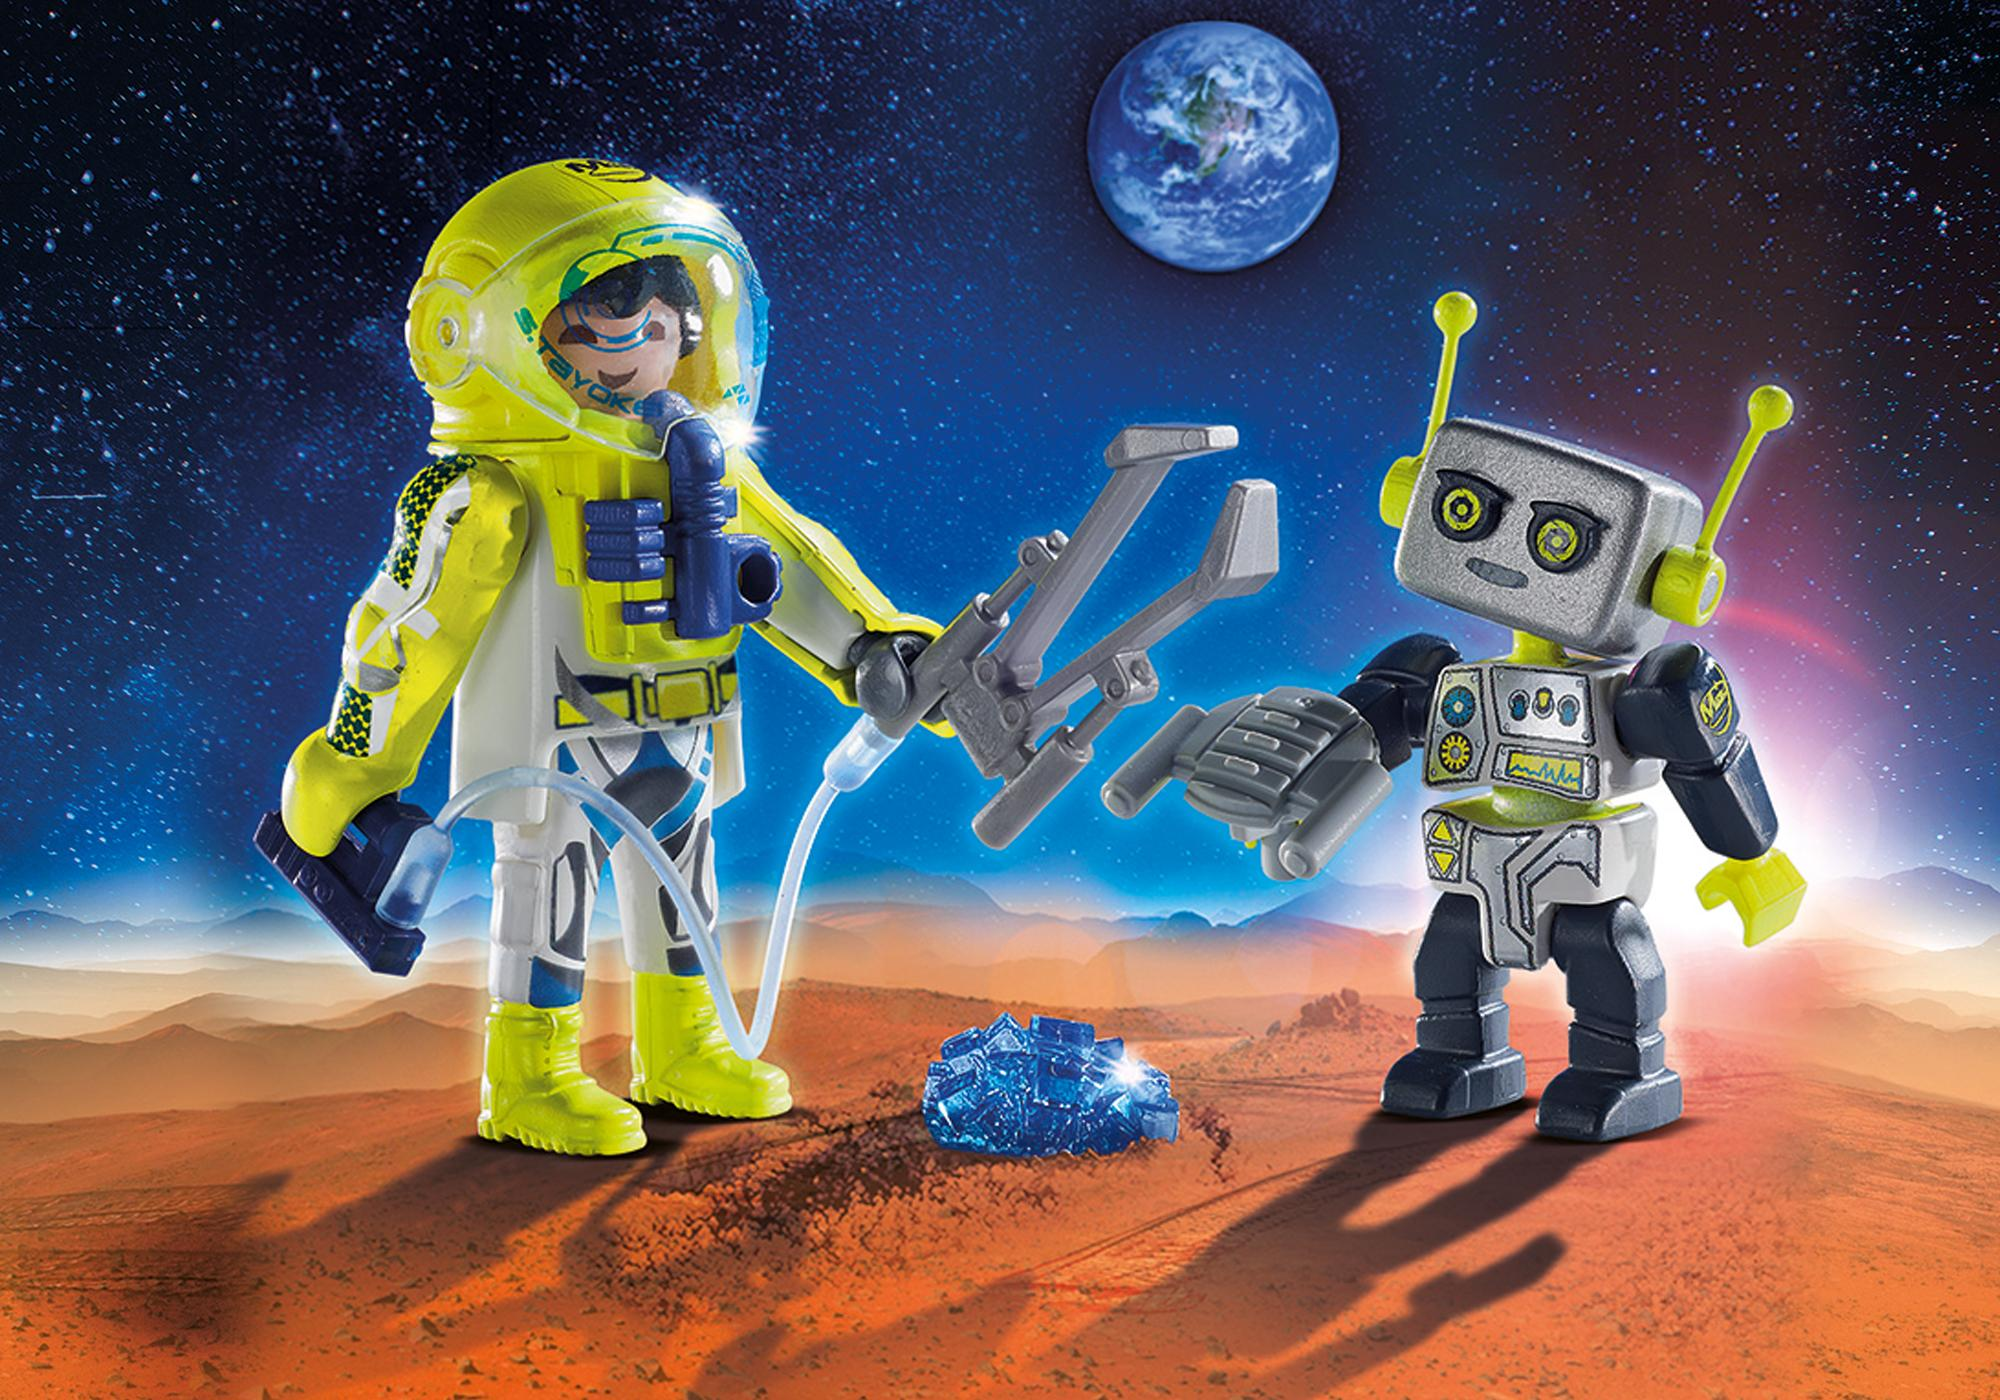 http://media.playmobil.com/i/playmobil/9492_product_detail/Duo Pack Astronaut und Roboter